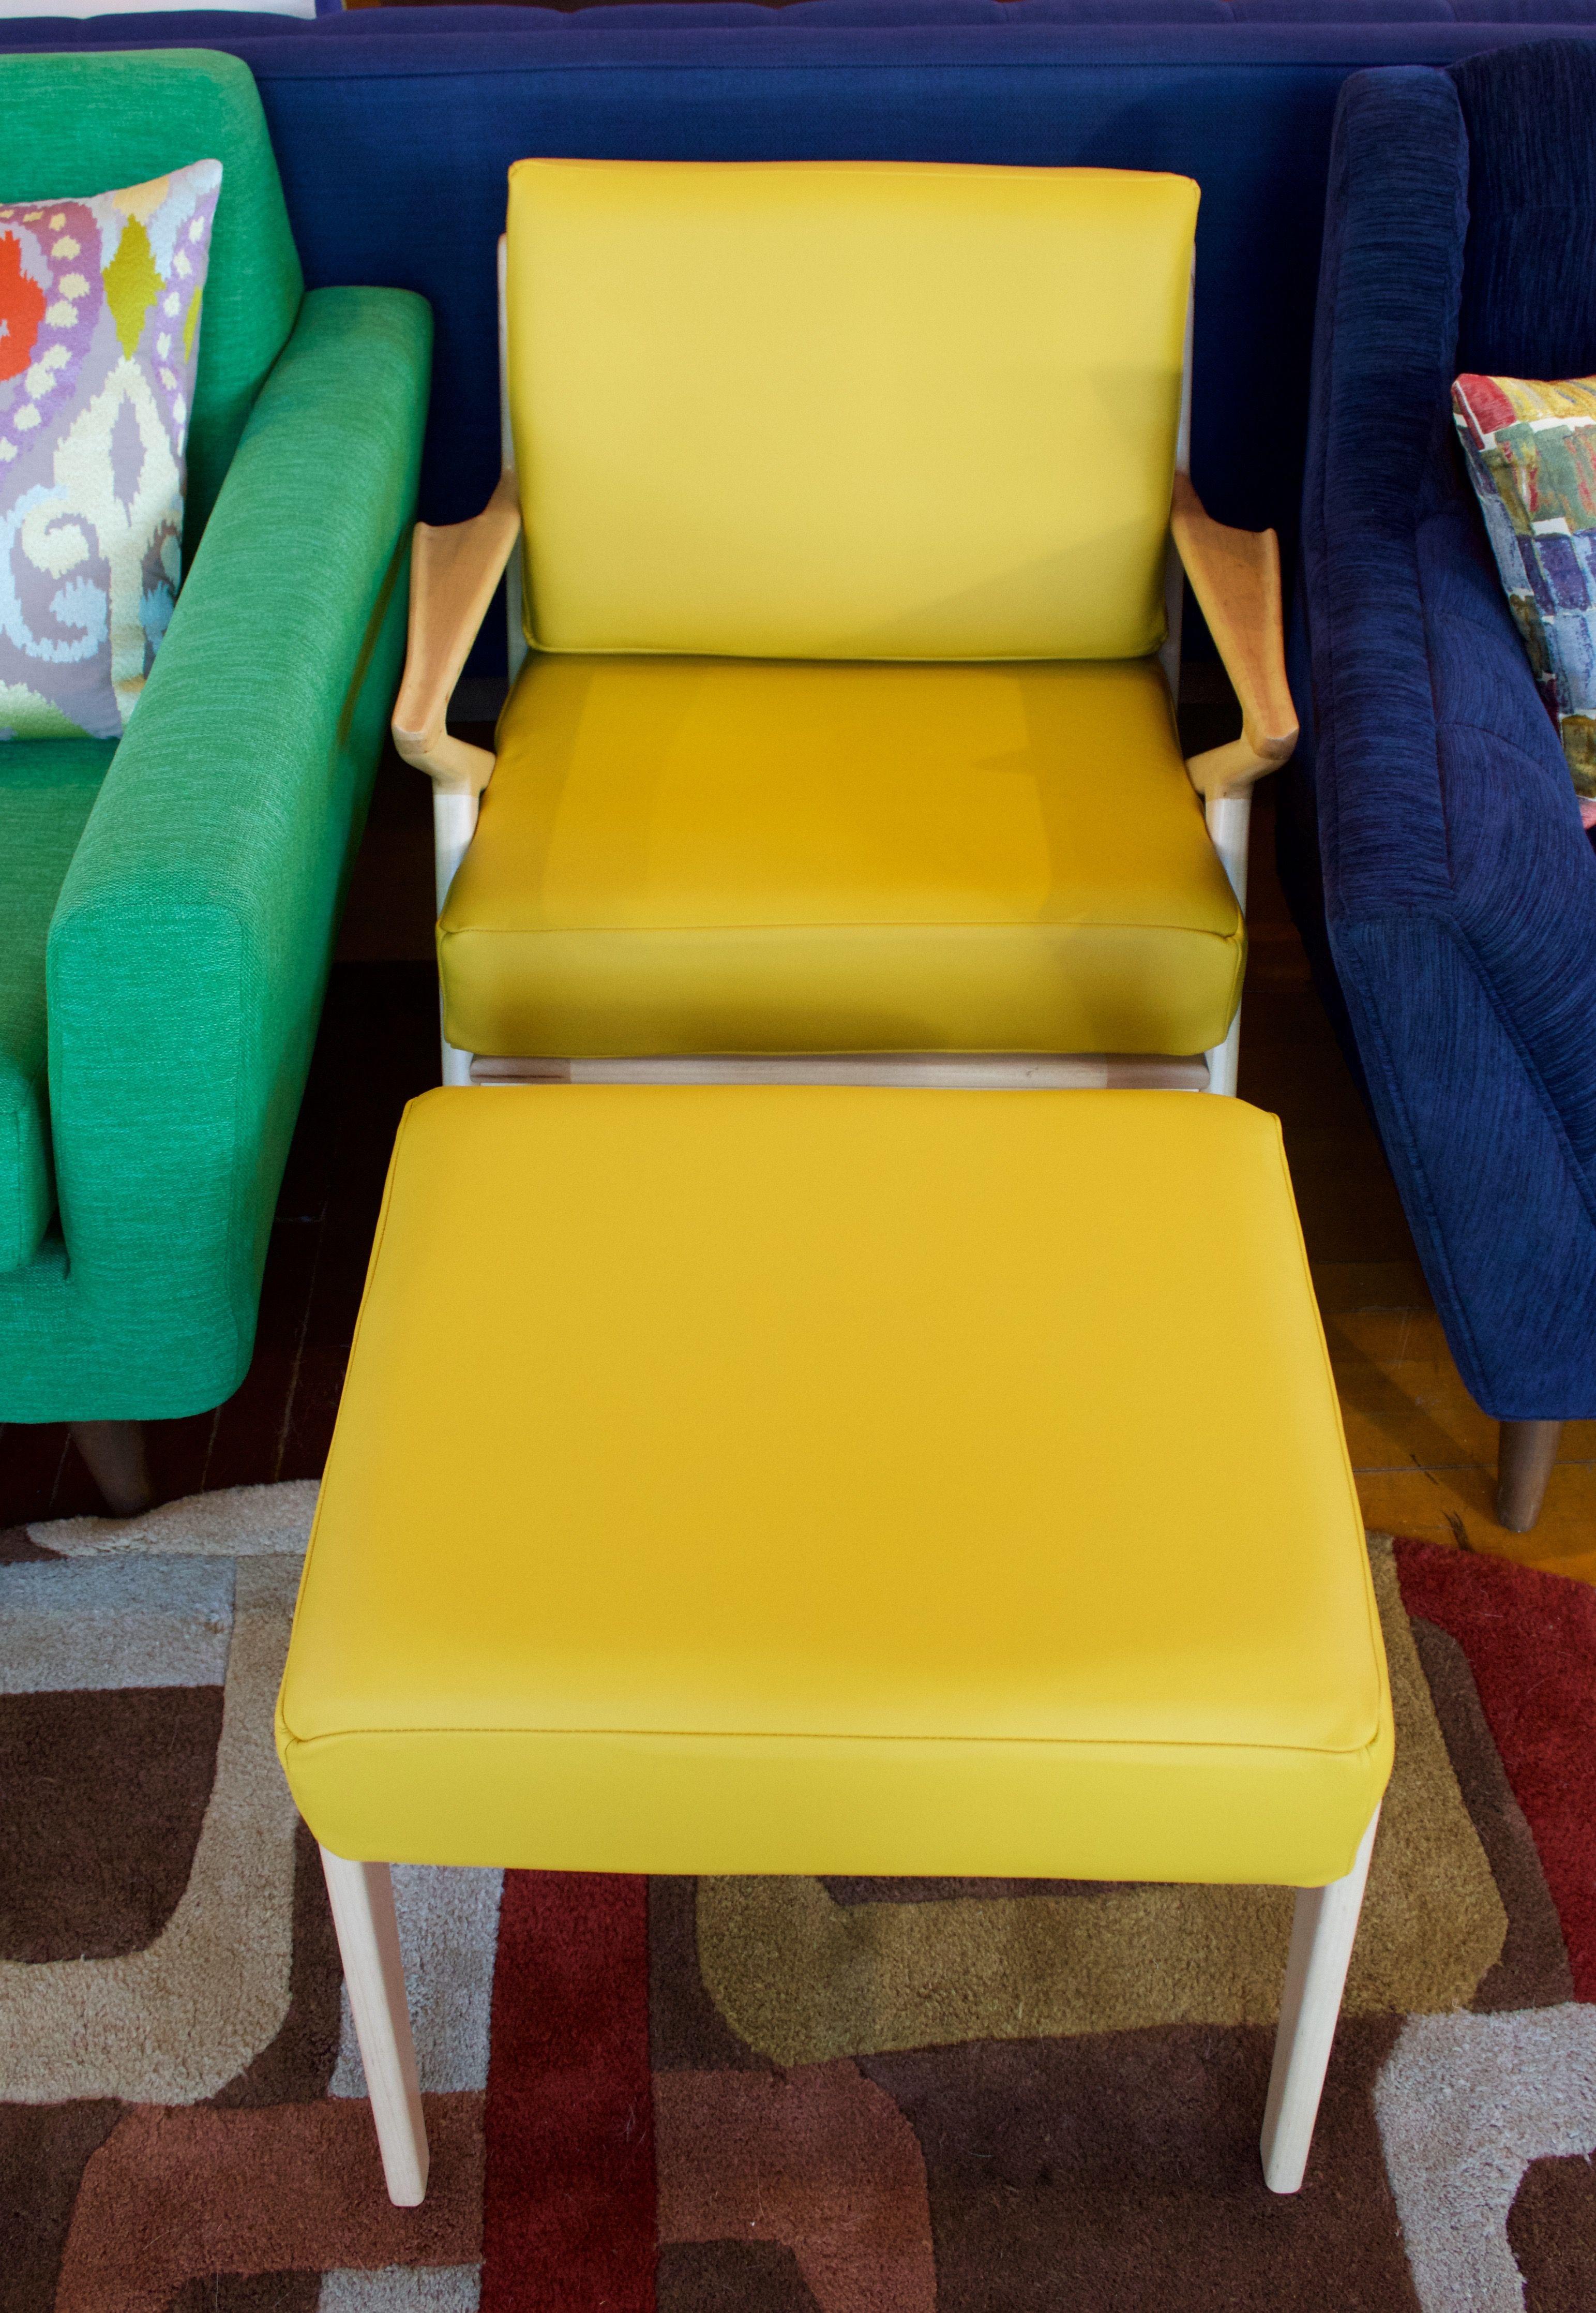 Prime Soto Concave Leather Chair In Brighton Lemon Grass Maple Inzonedesignstudio Interior Chair Design Inzonedesignstudiocom